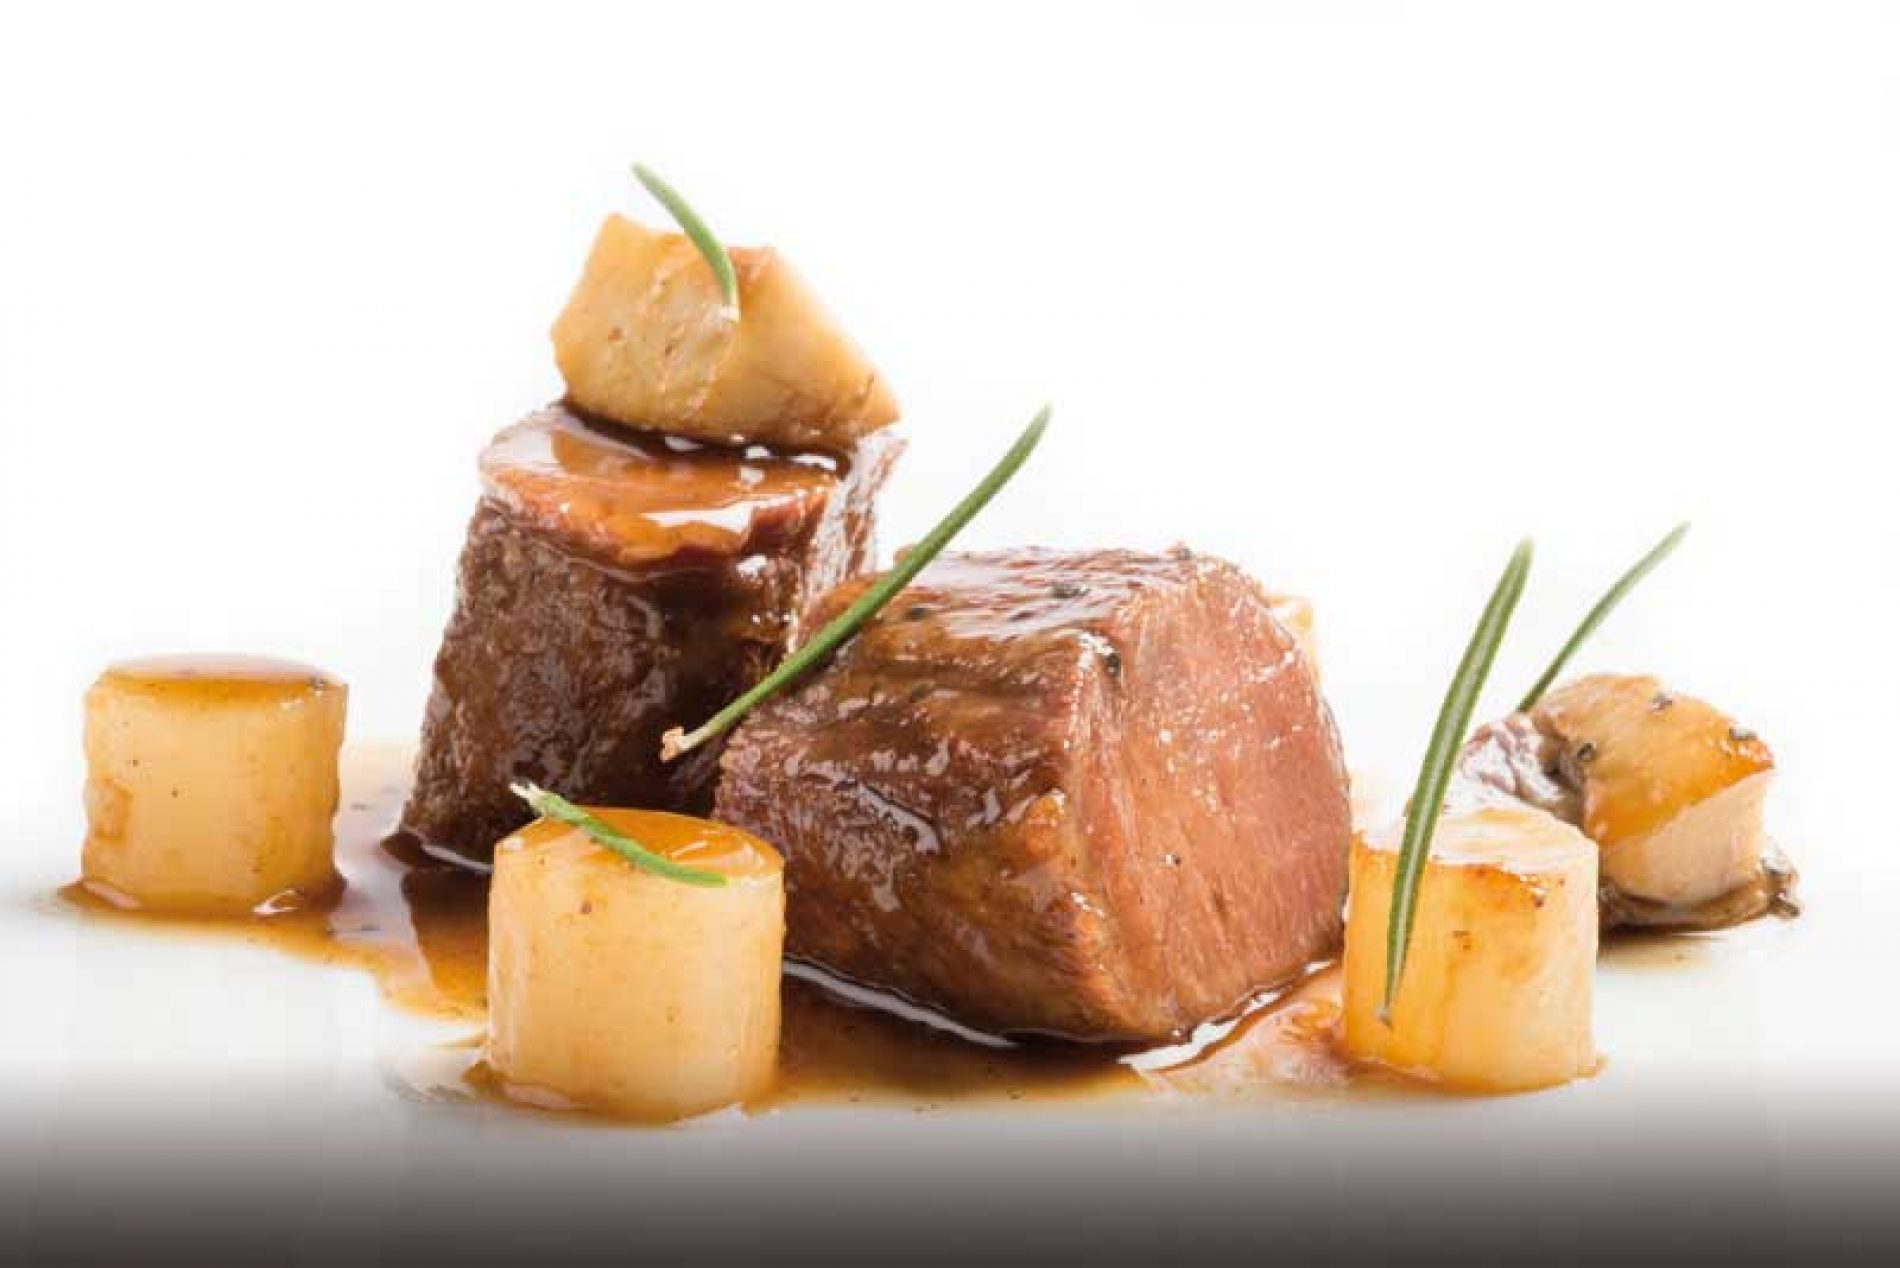 Receta de lomo de muflón, escorzonera y Boletus edulis